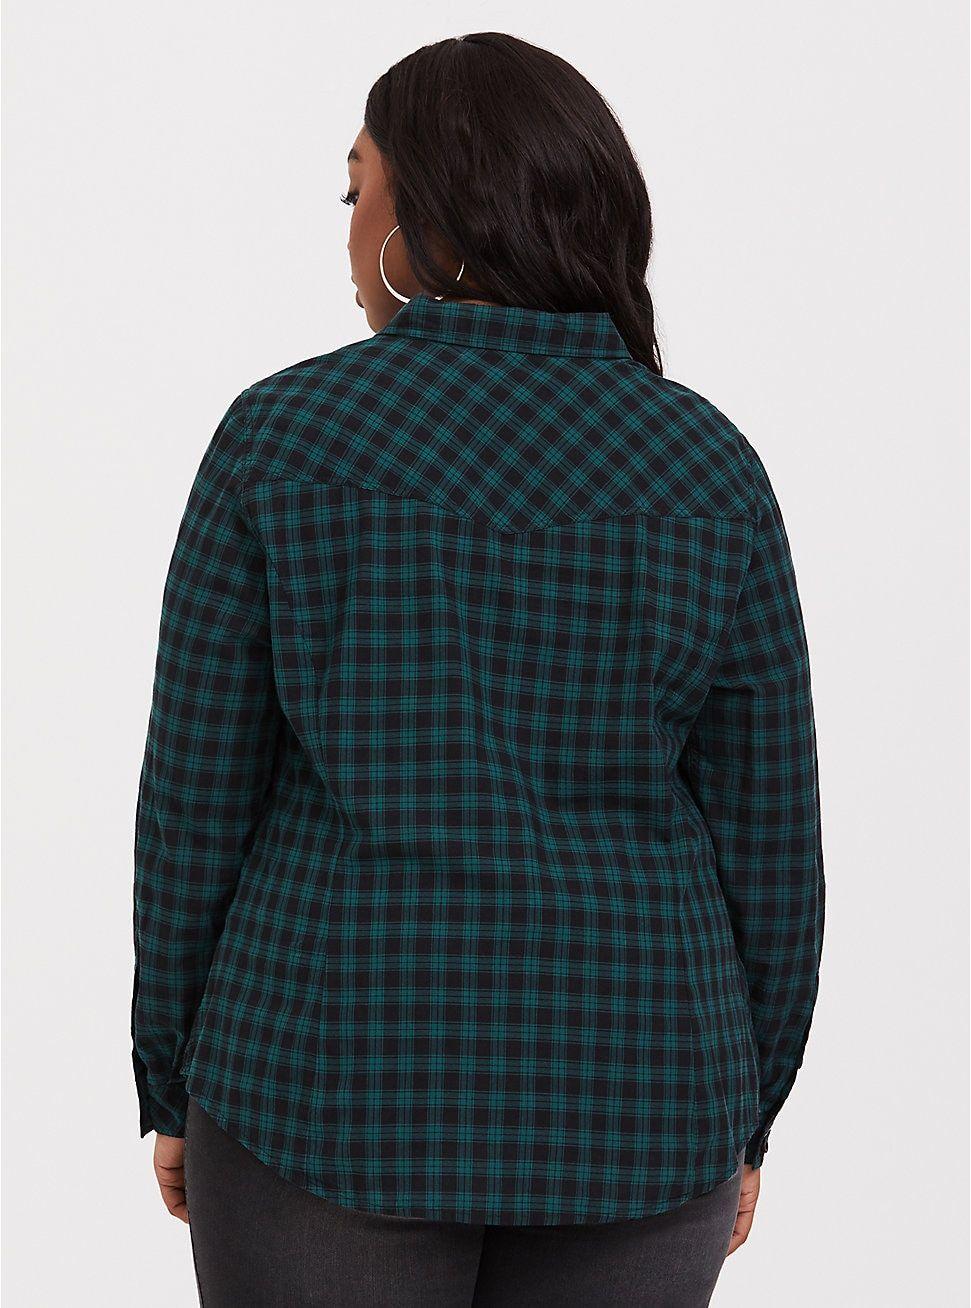 798f66e9d5520 Taylor - Green and Black Plaid Twill Camp Shirt